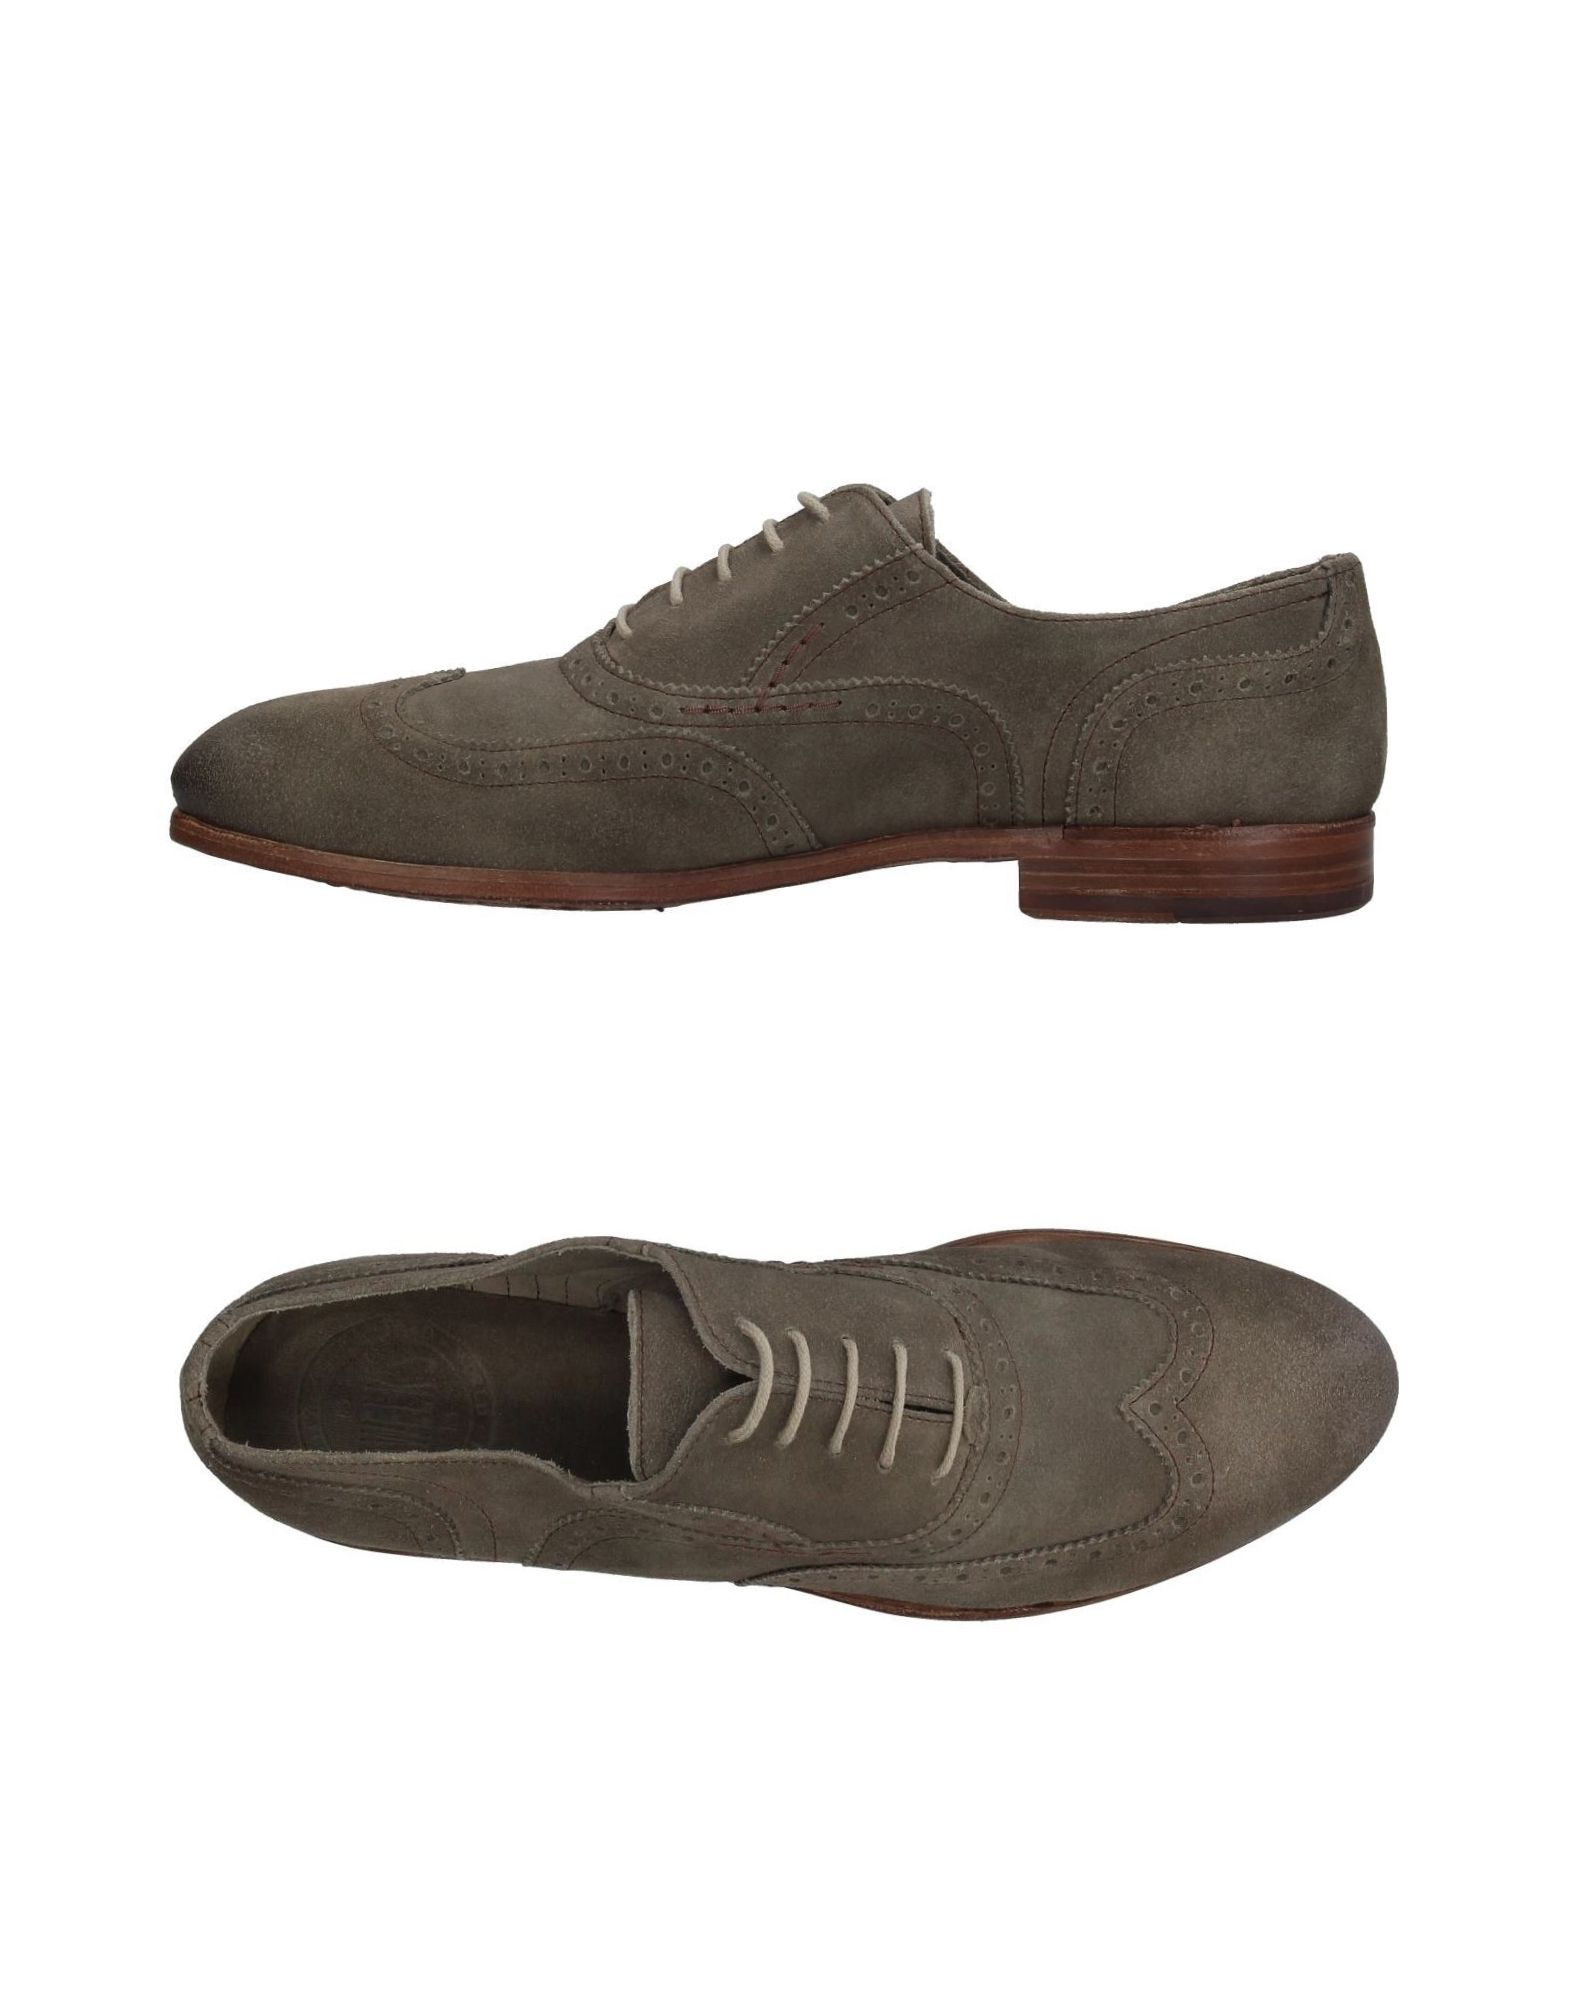 Rabatt echte Herren Schuhe Pawelk's Schnürschuhe Herren echte  11398409DR 34d0fd